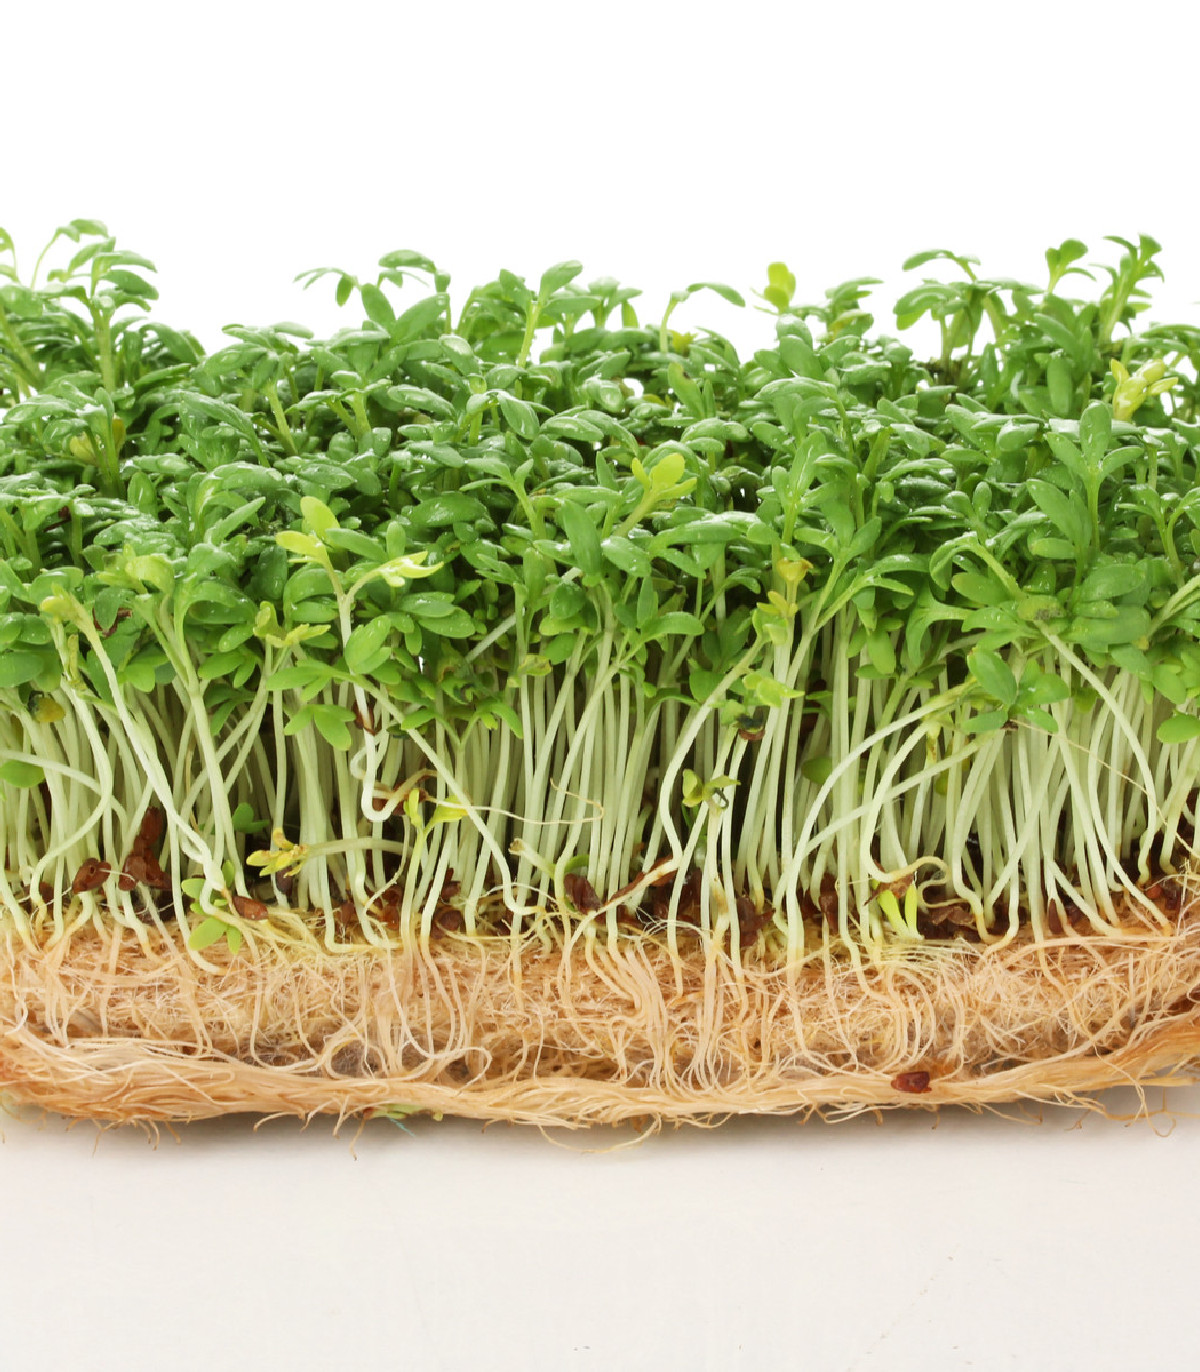 BIO žerucha Kresso - Lepidium sativum - bio semená žeruchy - 150 ks